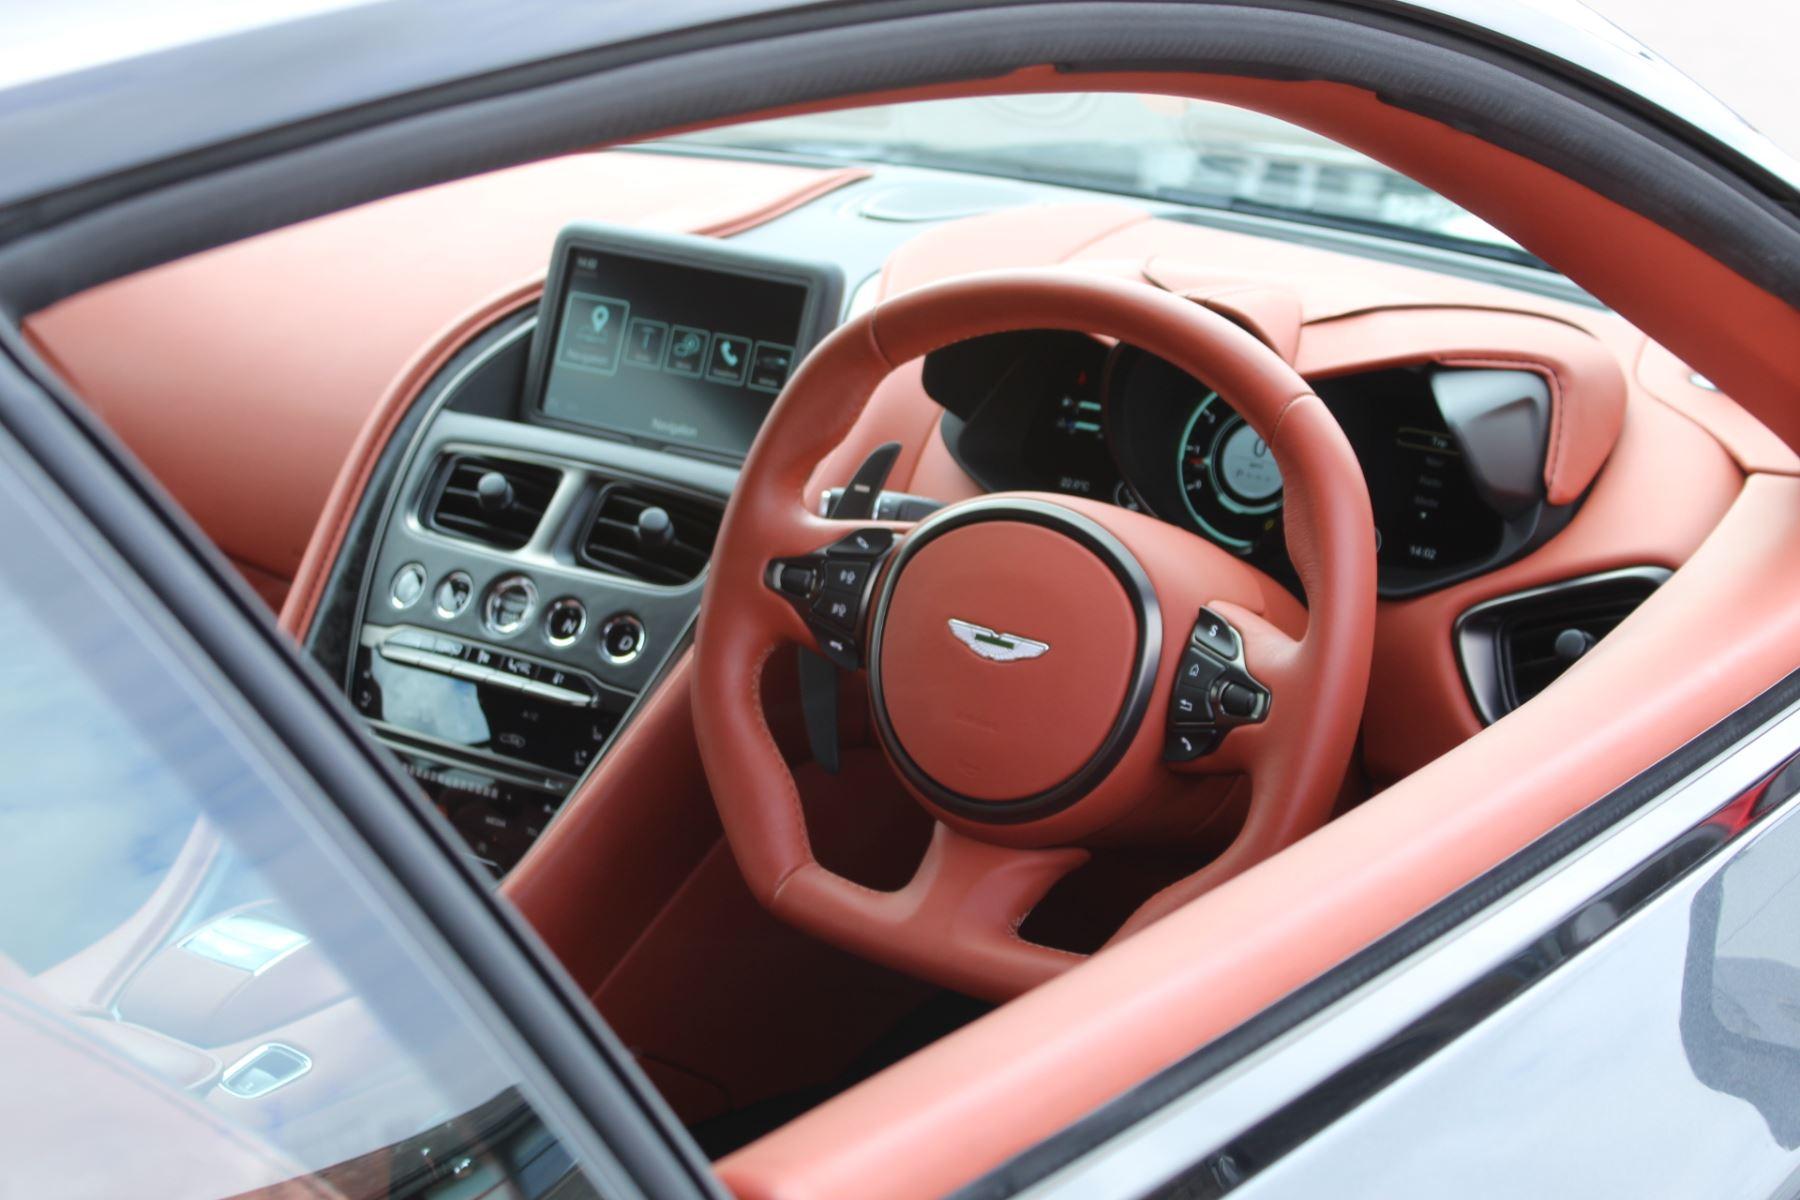 Aston Martin DBS V12 Superleggera 2dr Touchtronic image 24